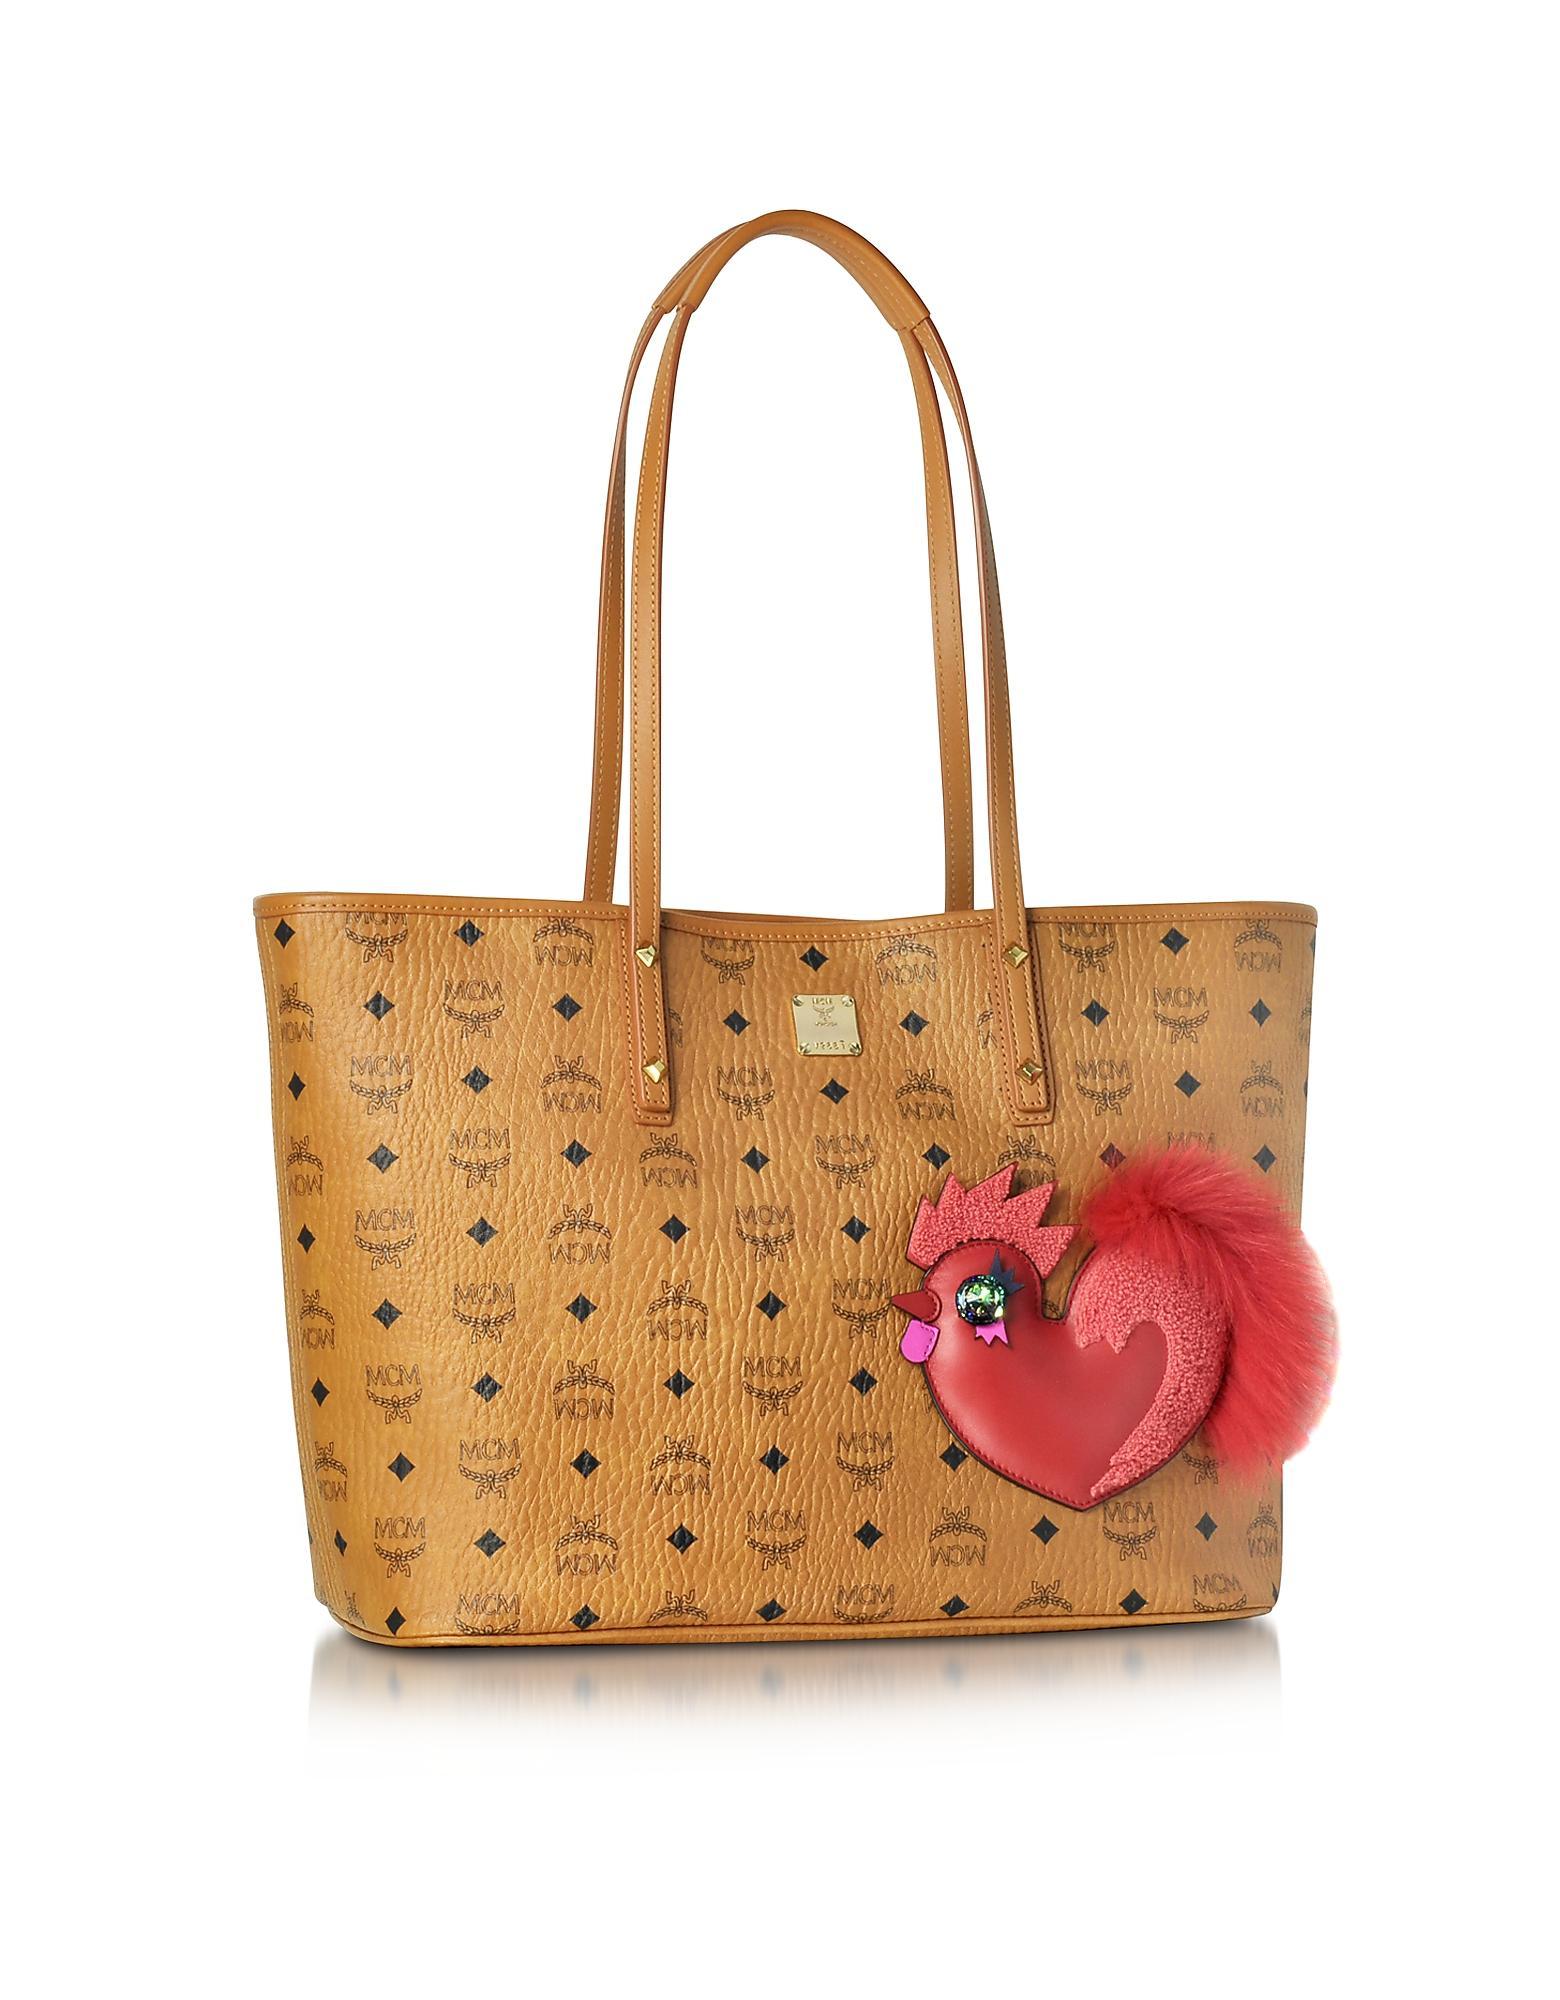 Mcm New Year Series Ew Medium Shopping Bag